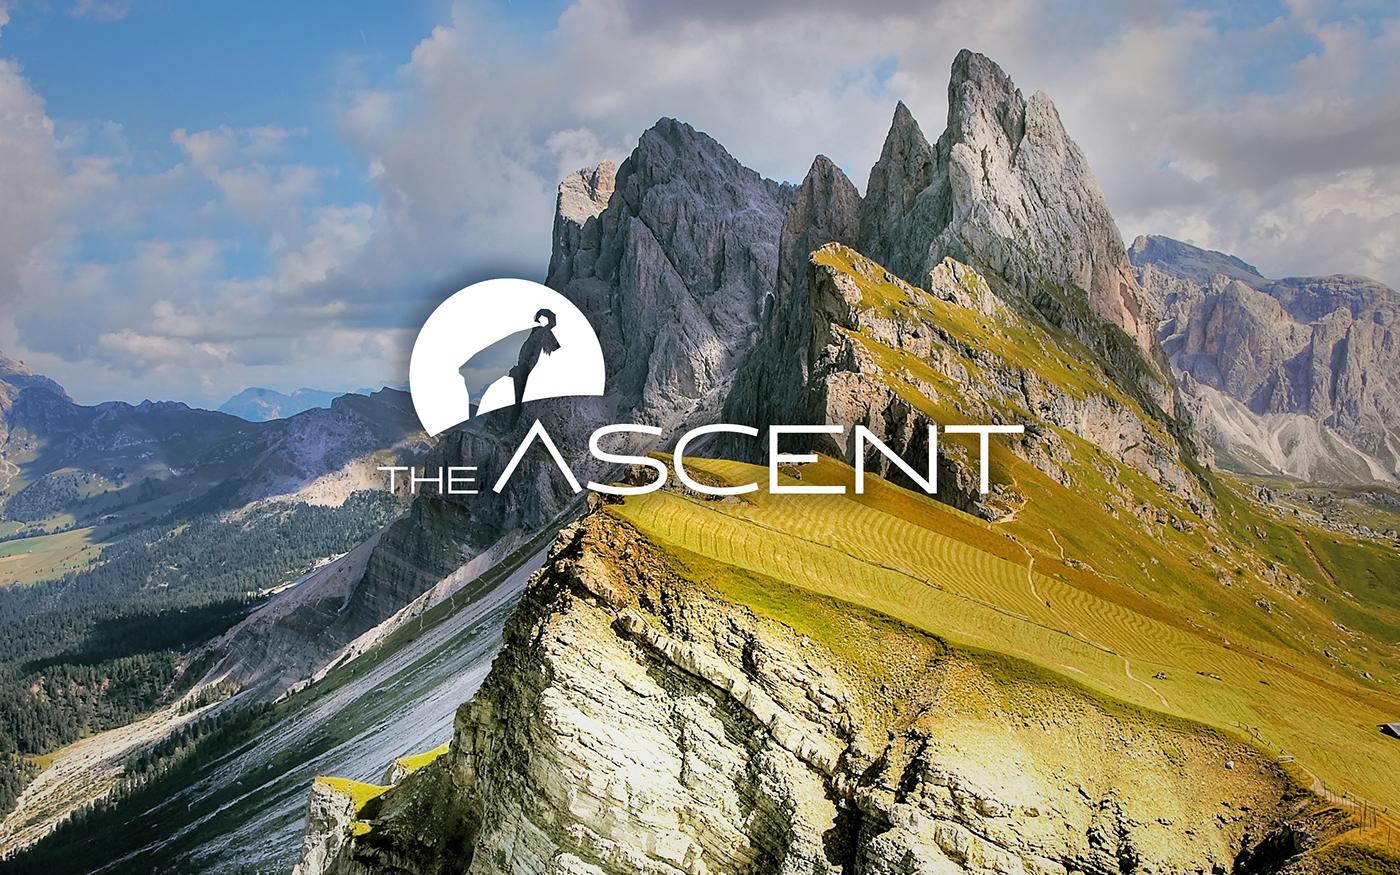 The Ascent website